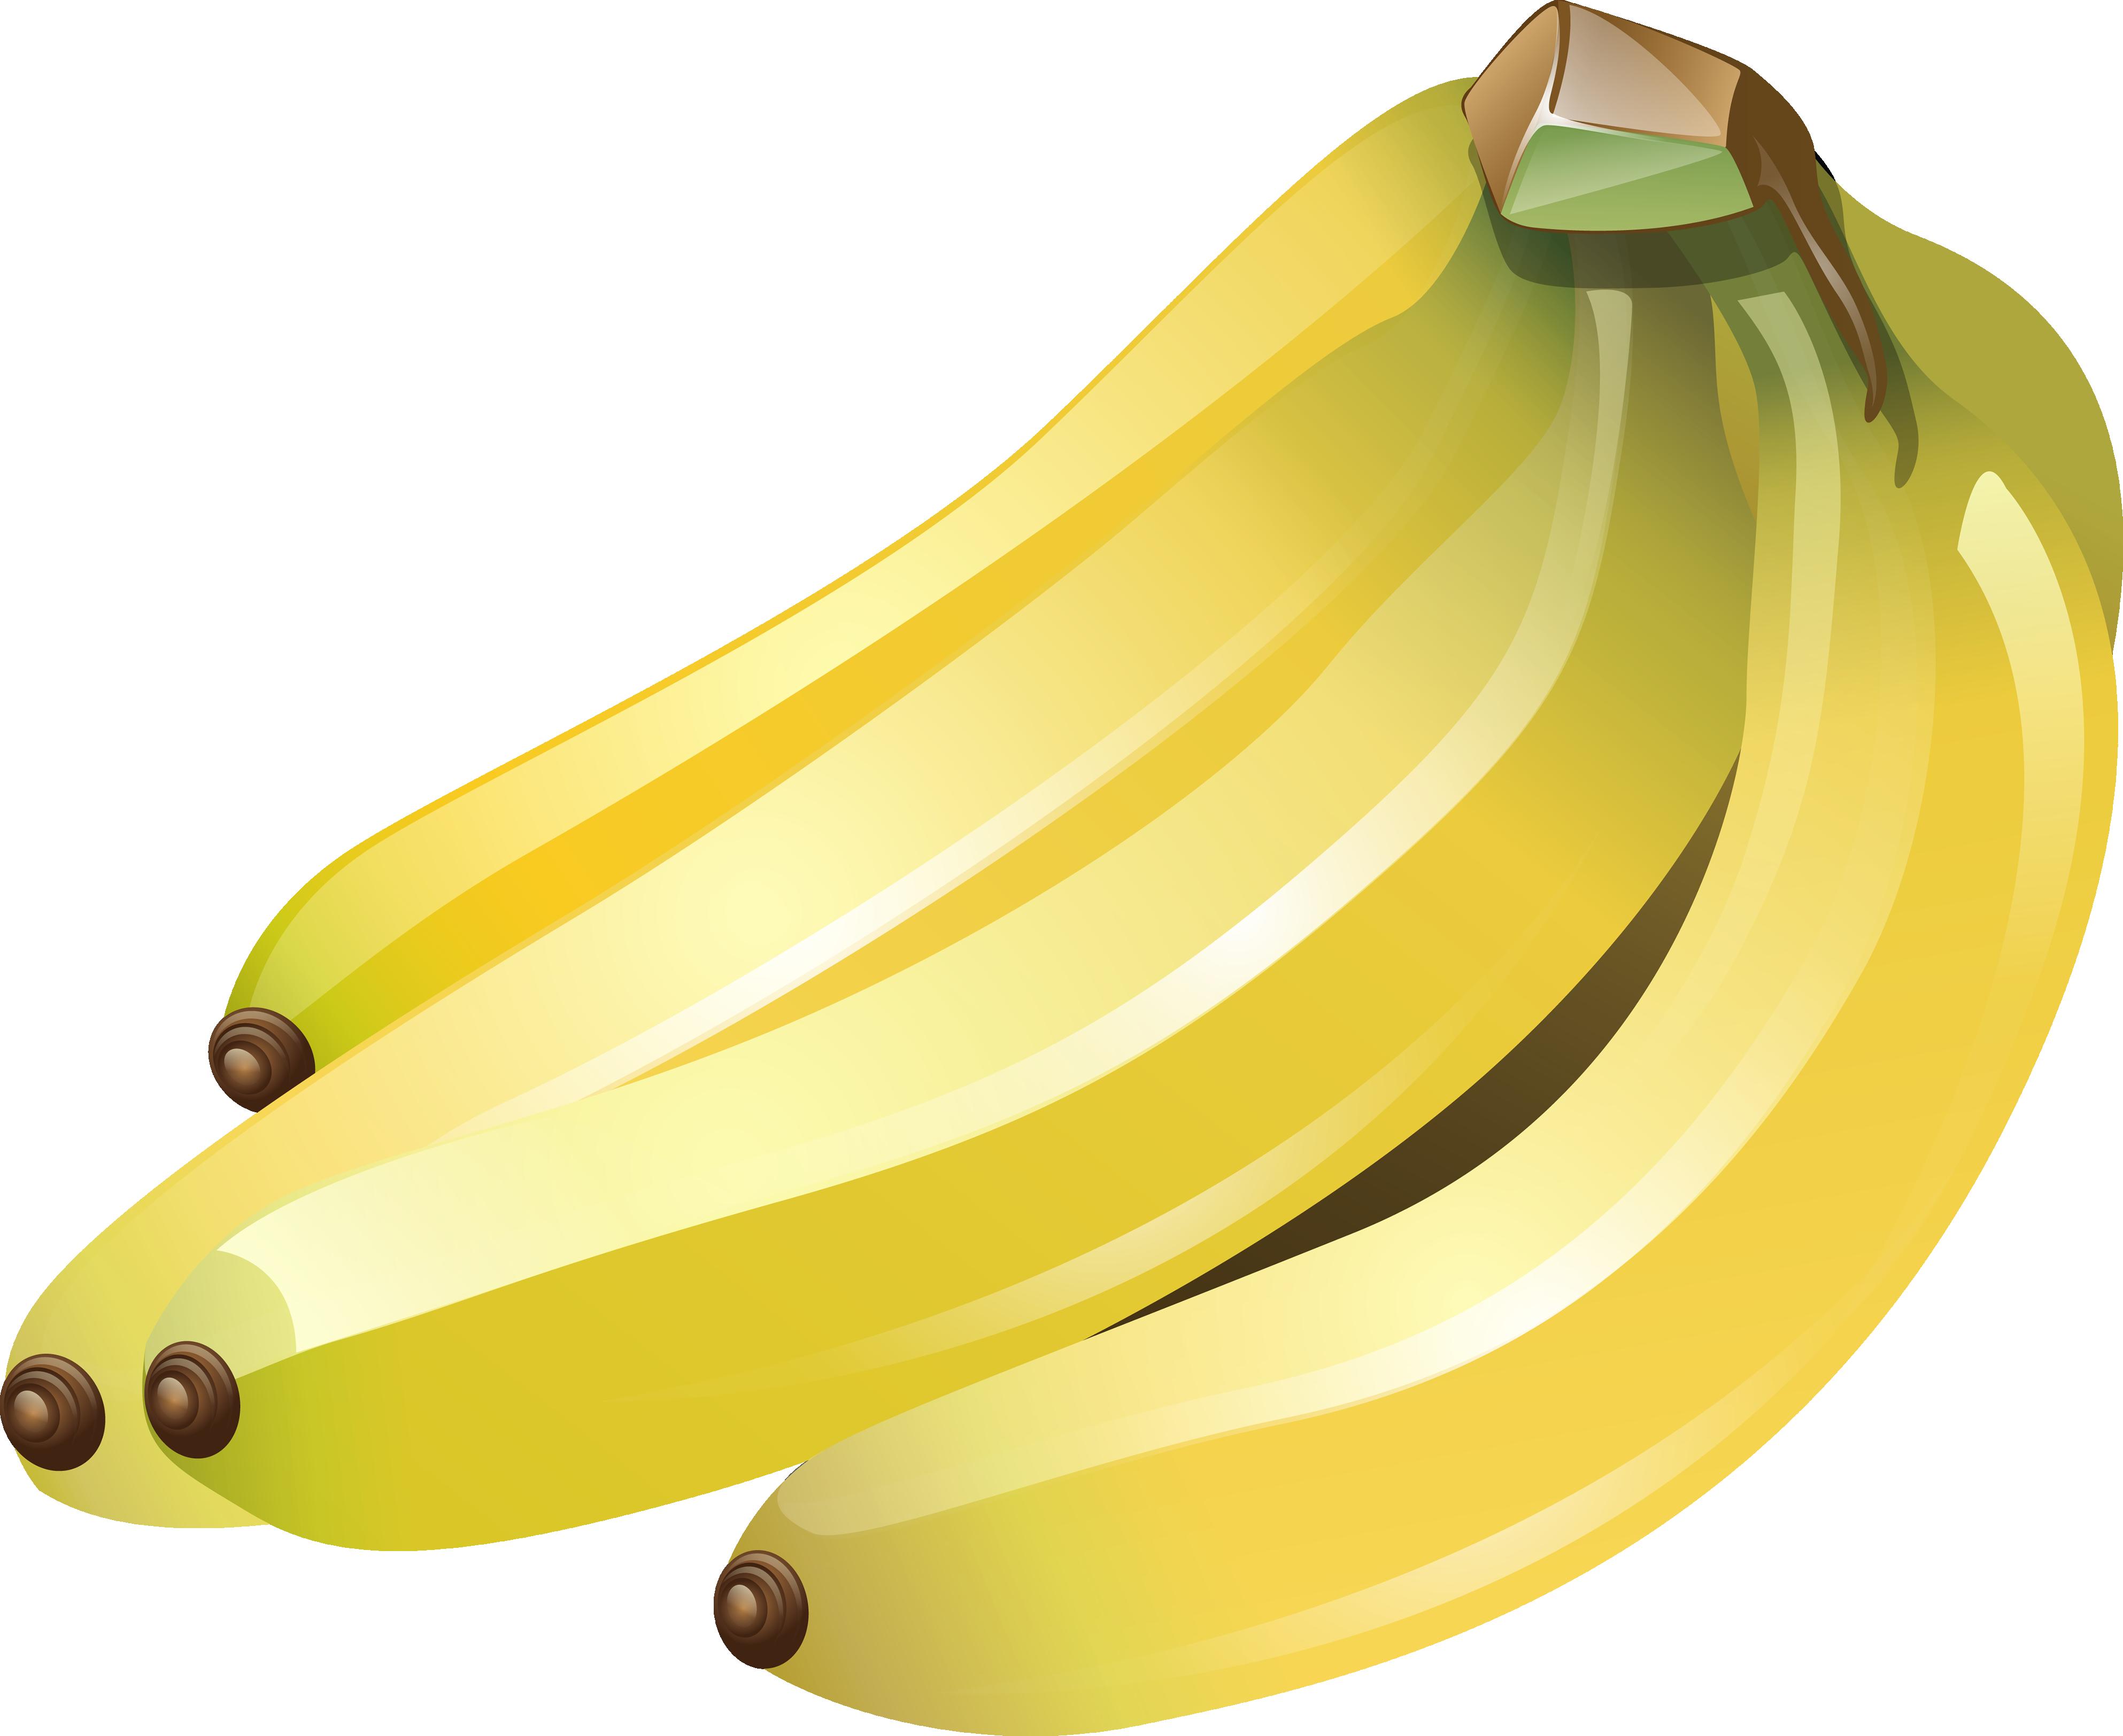 banana clipart high quality